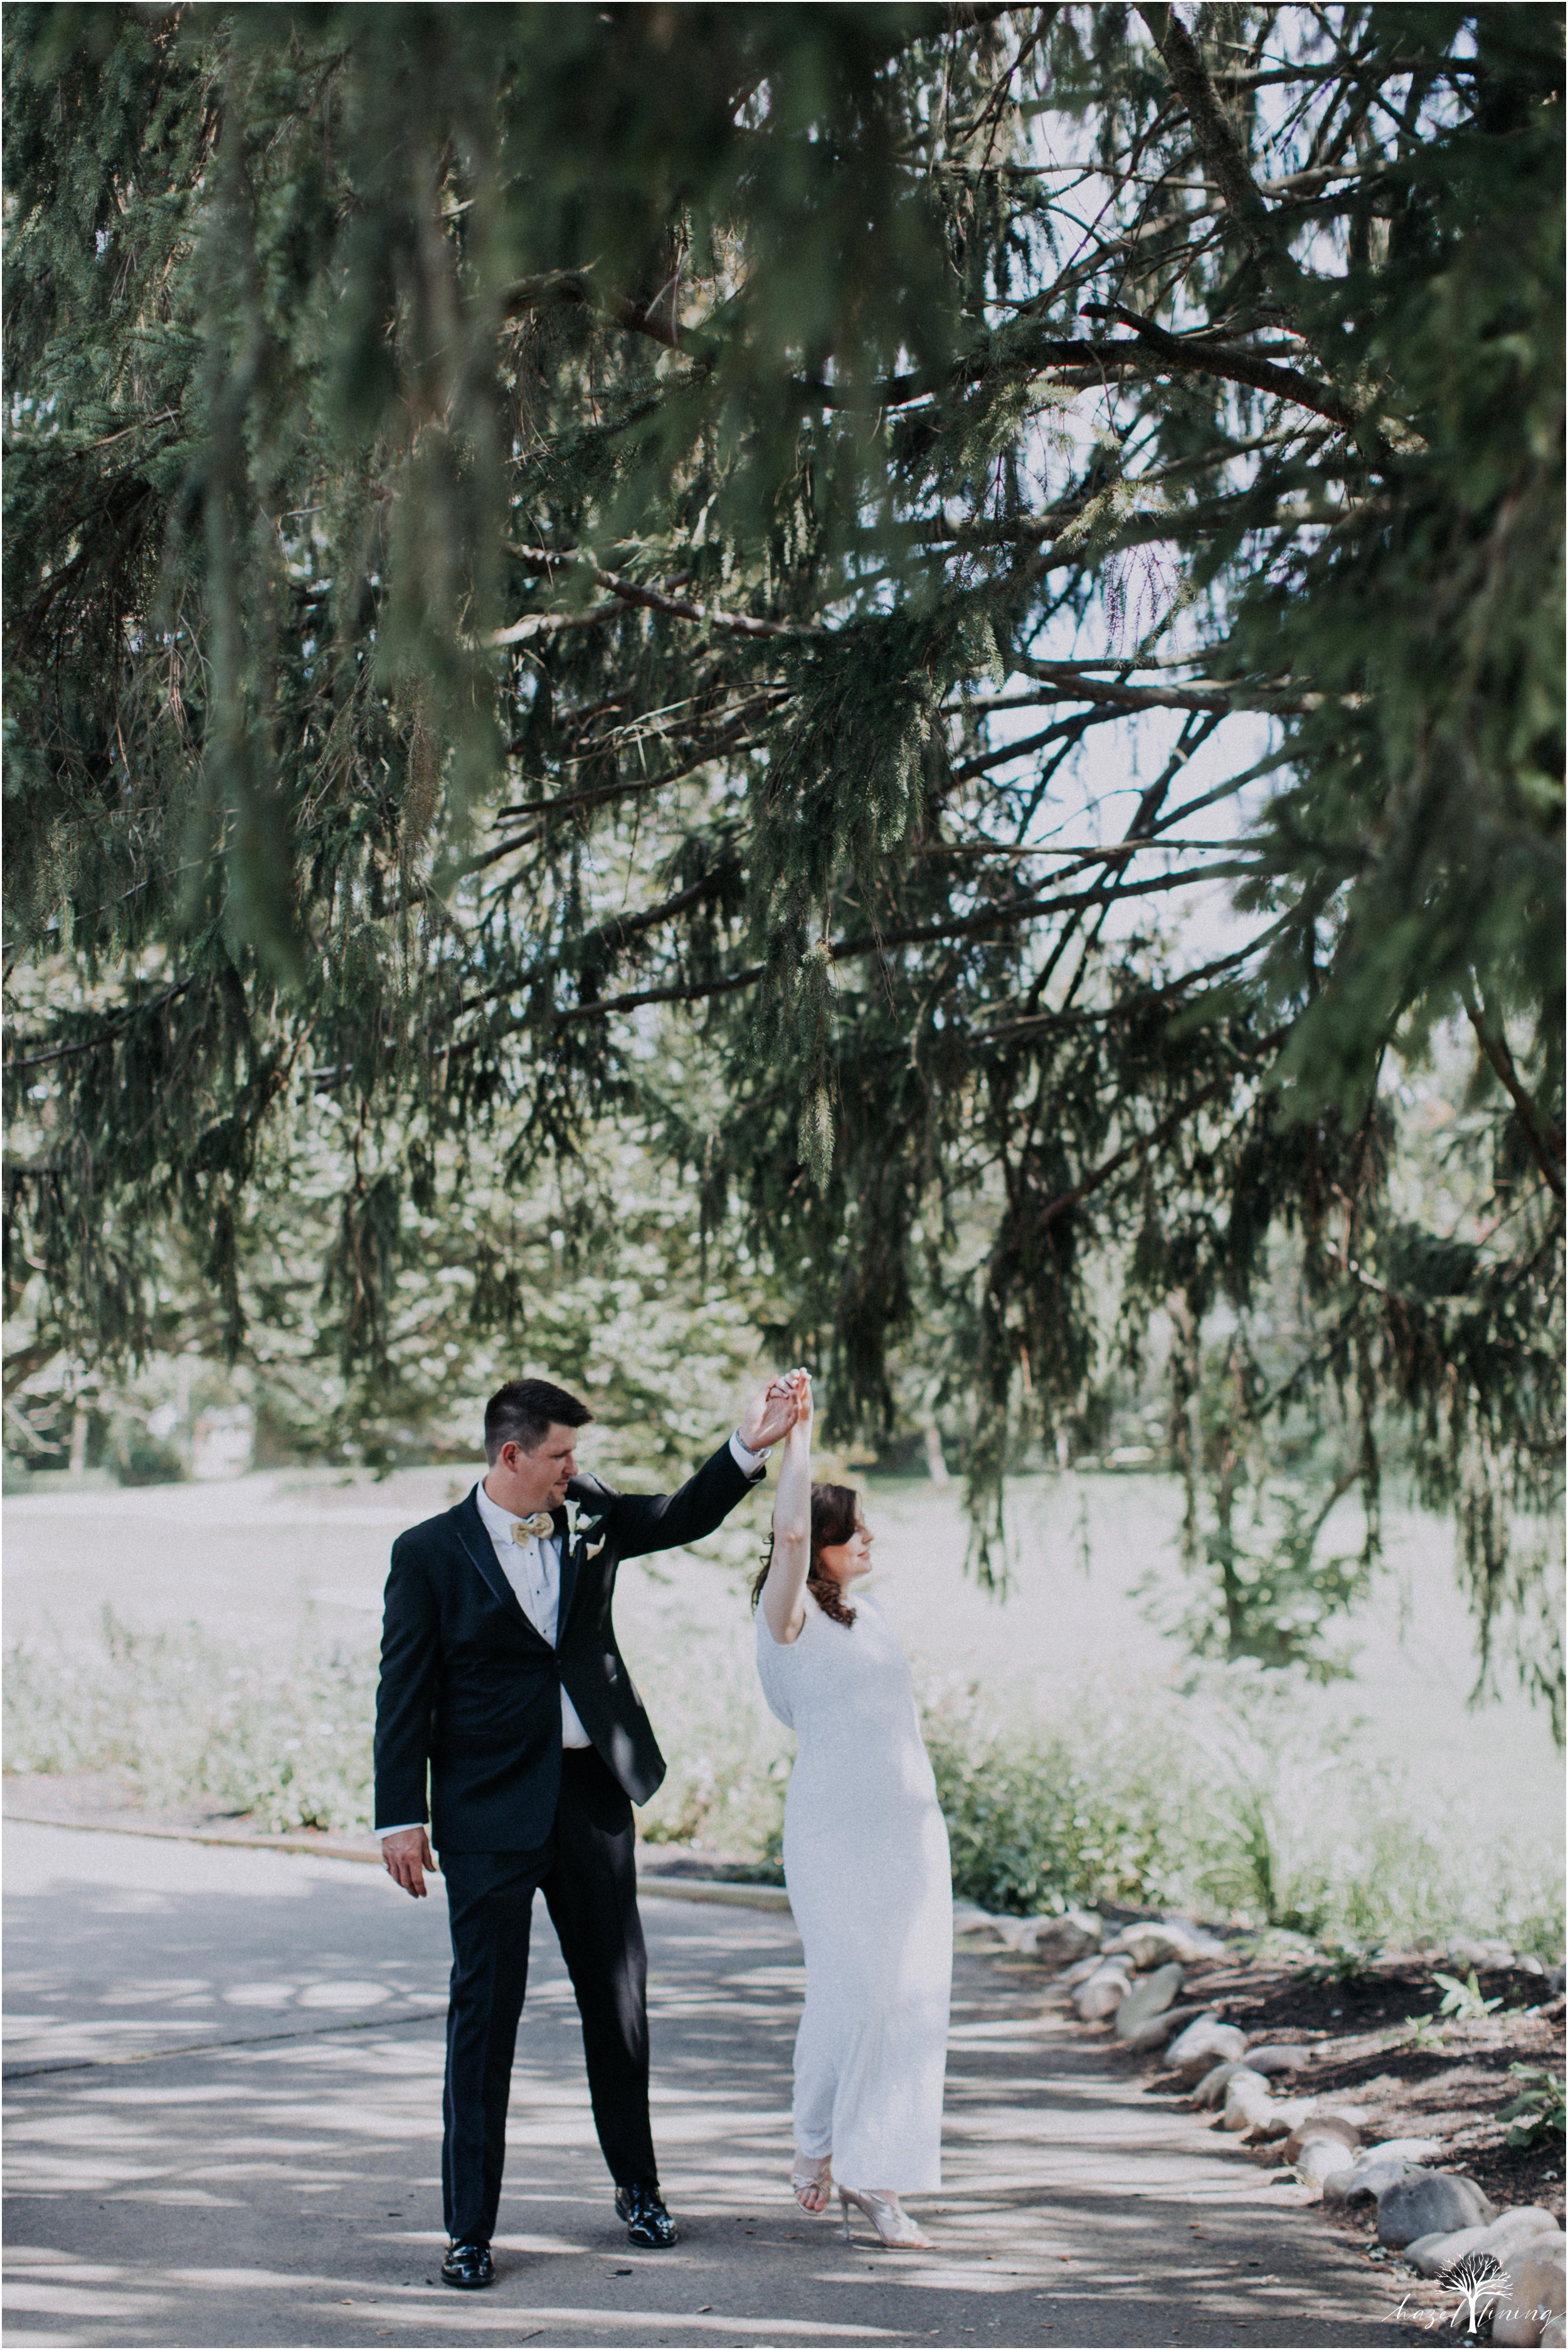 elizabeth-doelp-andrew-foreback-middletown-country-club-summer-langhorne-pennsylvania-wedding-hazel-lining-travel-wedding-elopement-photography_0101.jpg